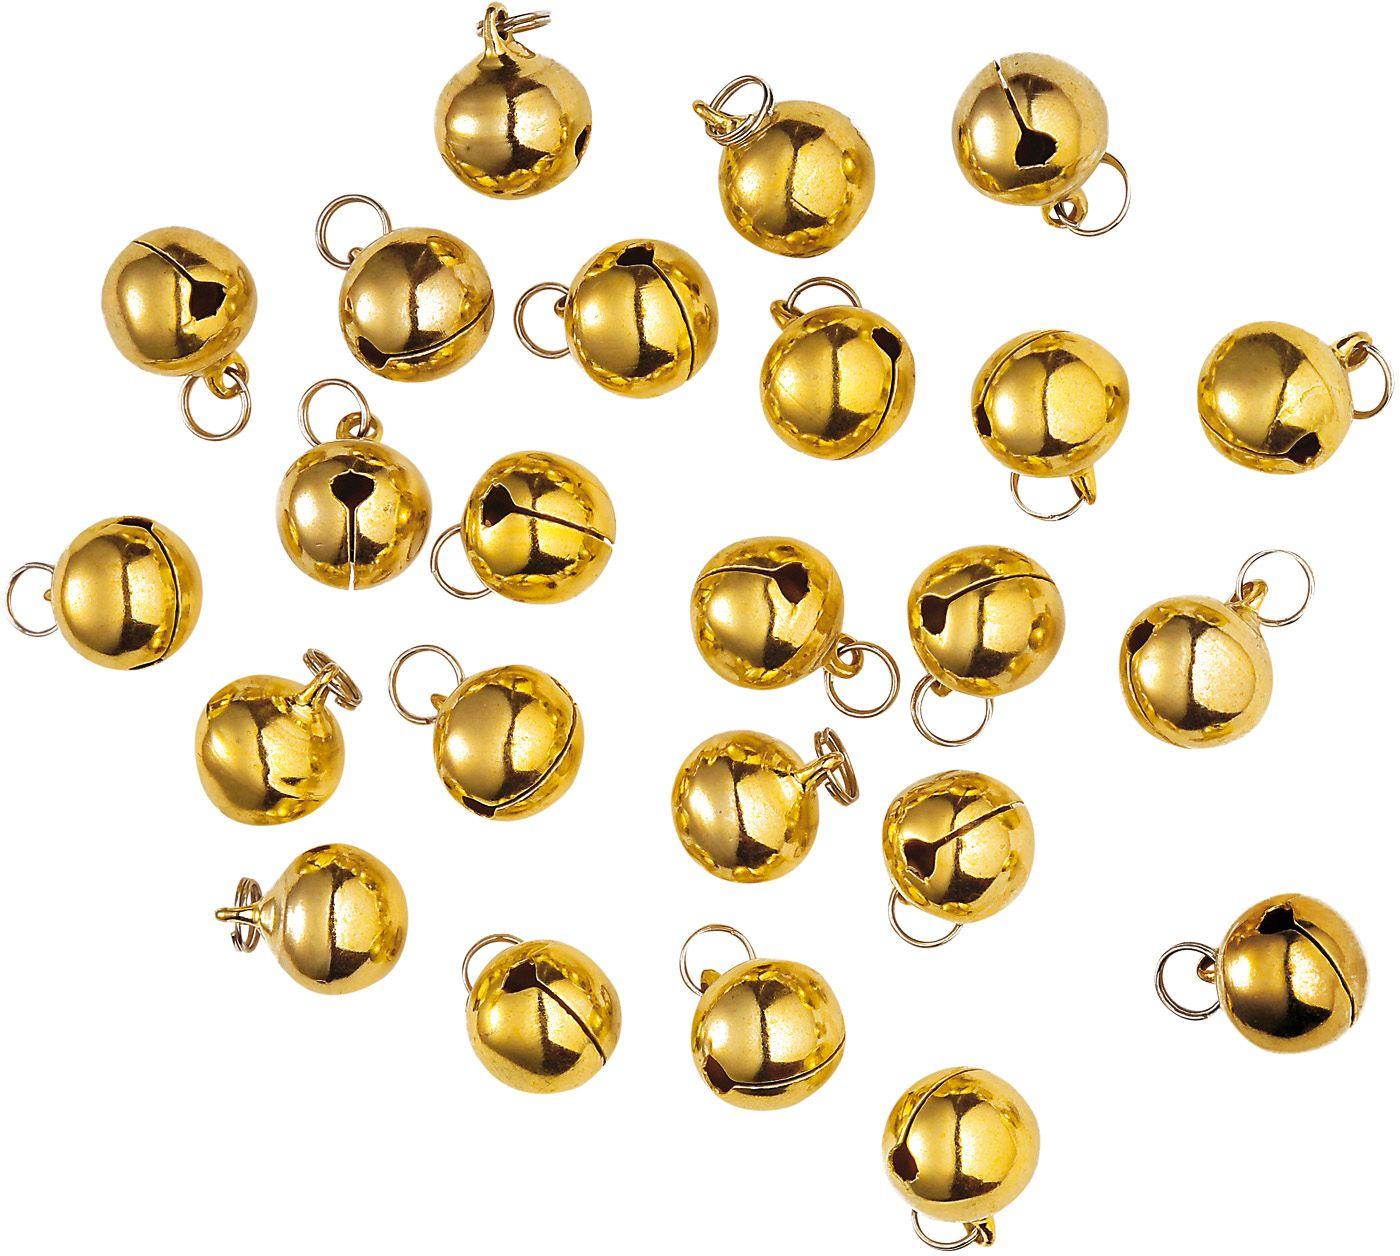 Setje met 24 gouden belletjes